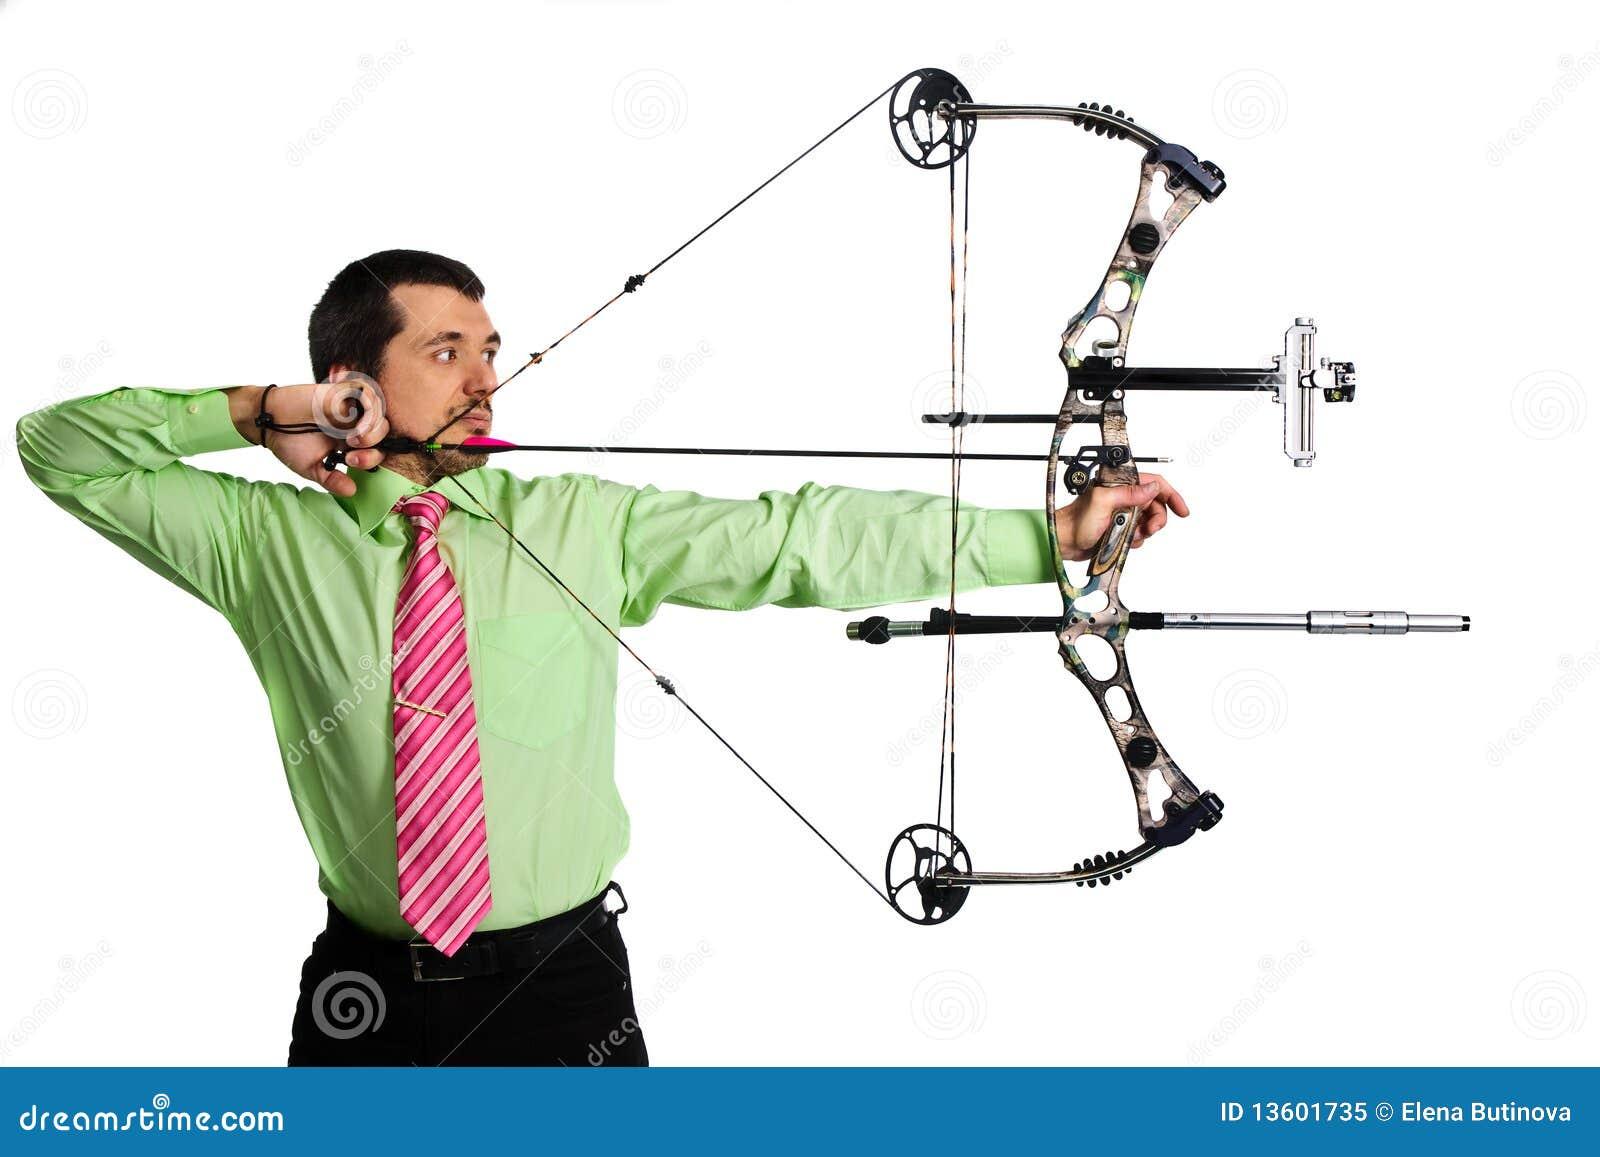 Bow-hunter Royalty Free Stock Photo - Image: 13601735